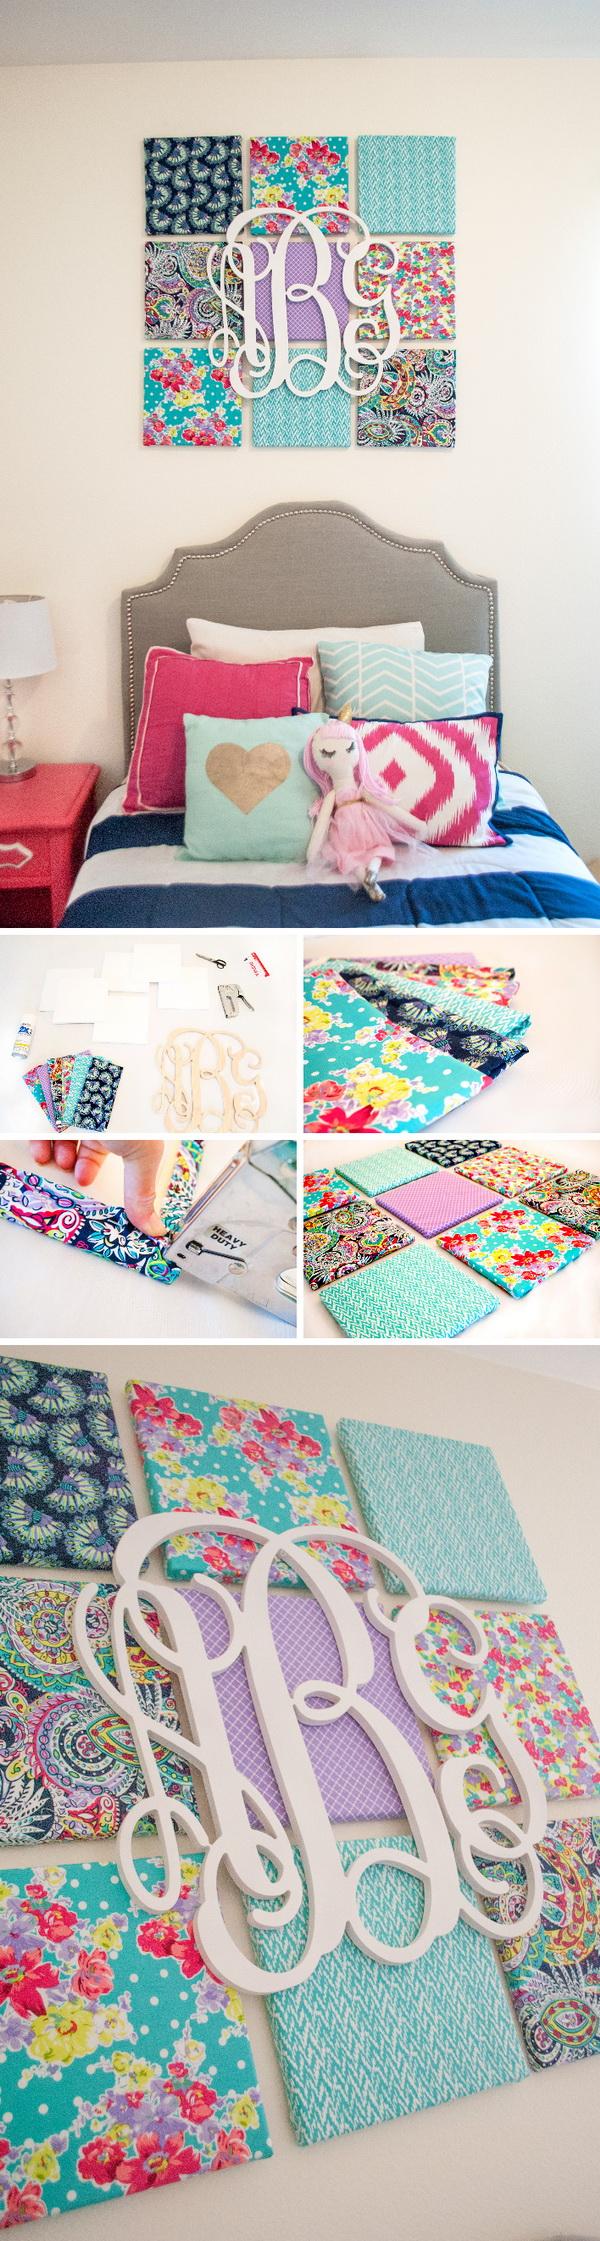 DIY Fabric  Canvas and Monogram Wall Art.